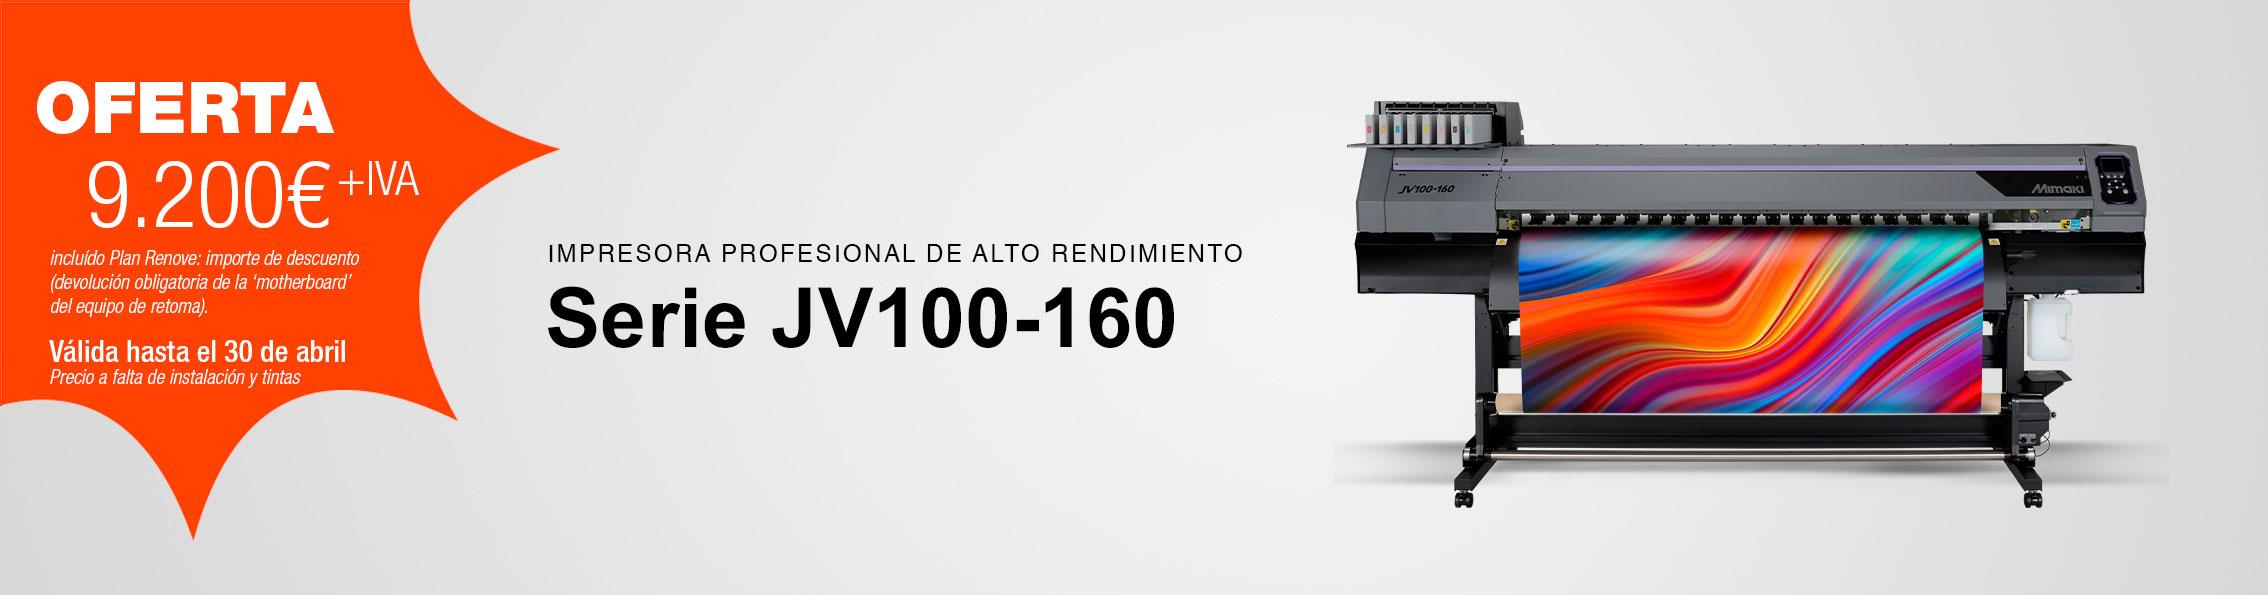 OFERTAS-JV100